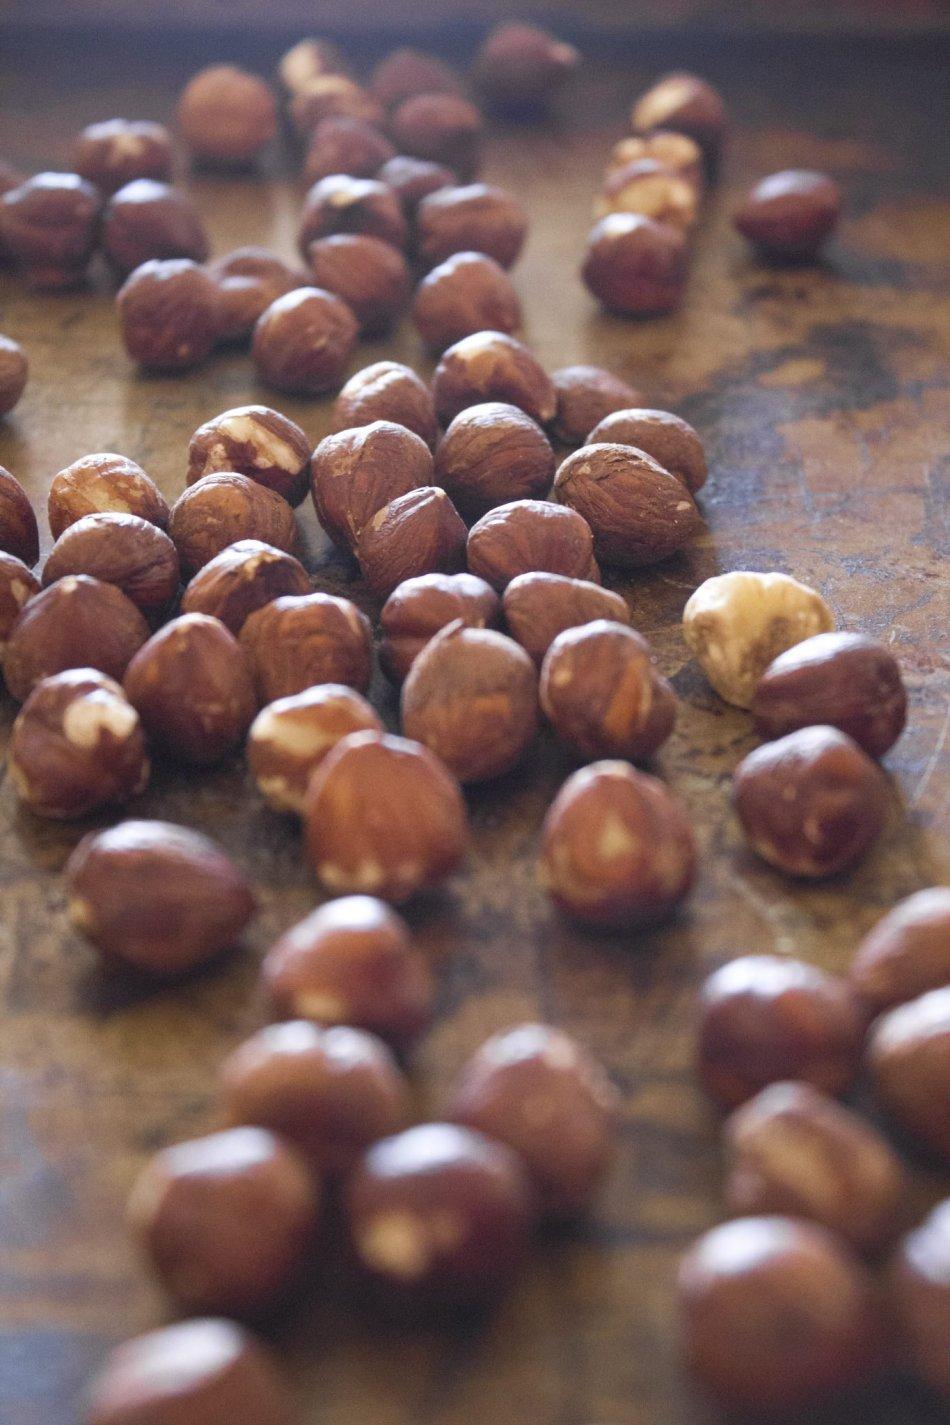 Chocolate-Nut Crunch Granola | No refined sugar, gluten-free & vegan.